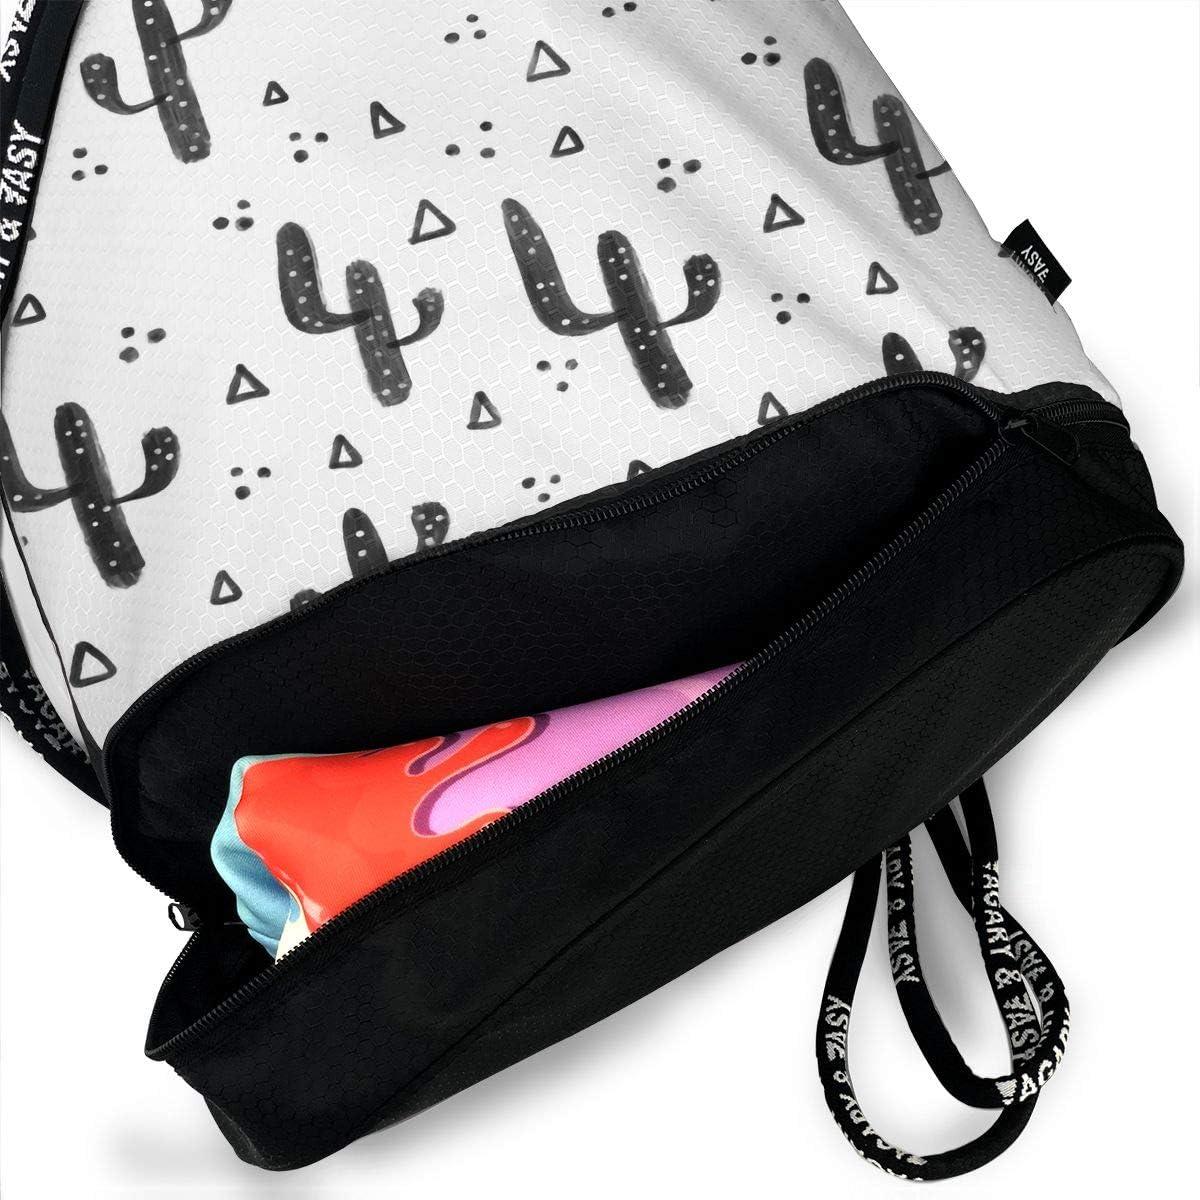 Drawstring Backpack Cactus Cacti Shoulder Bags